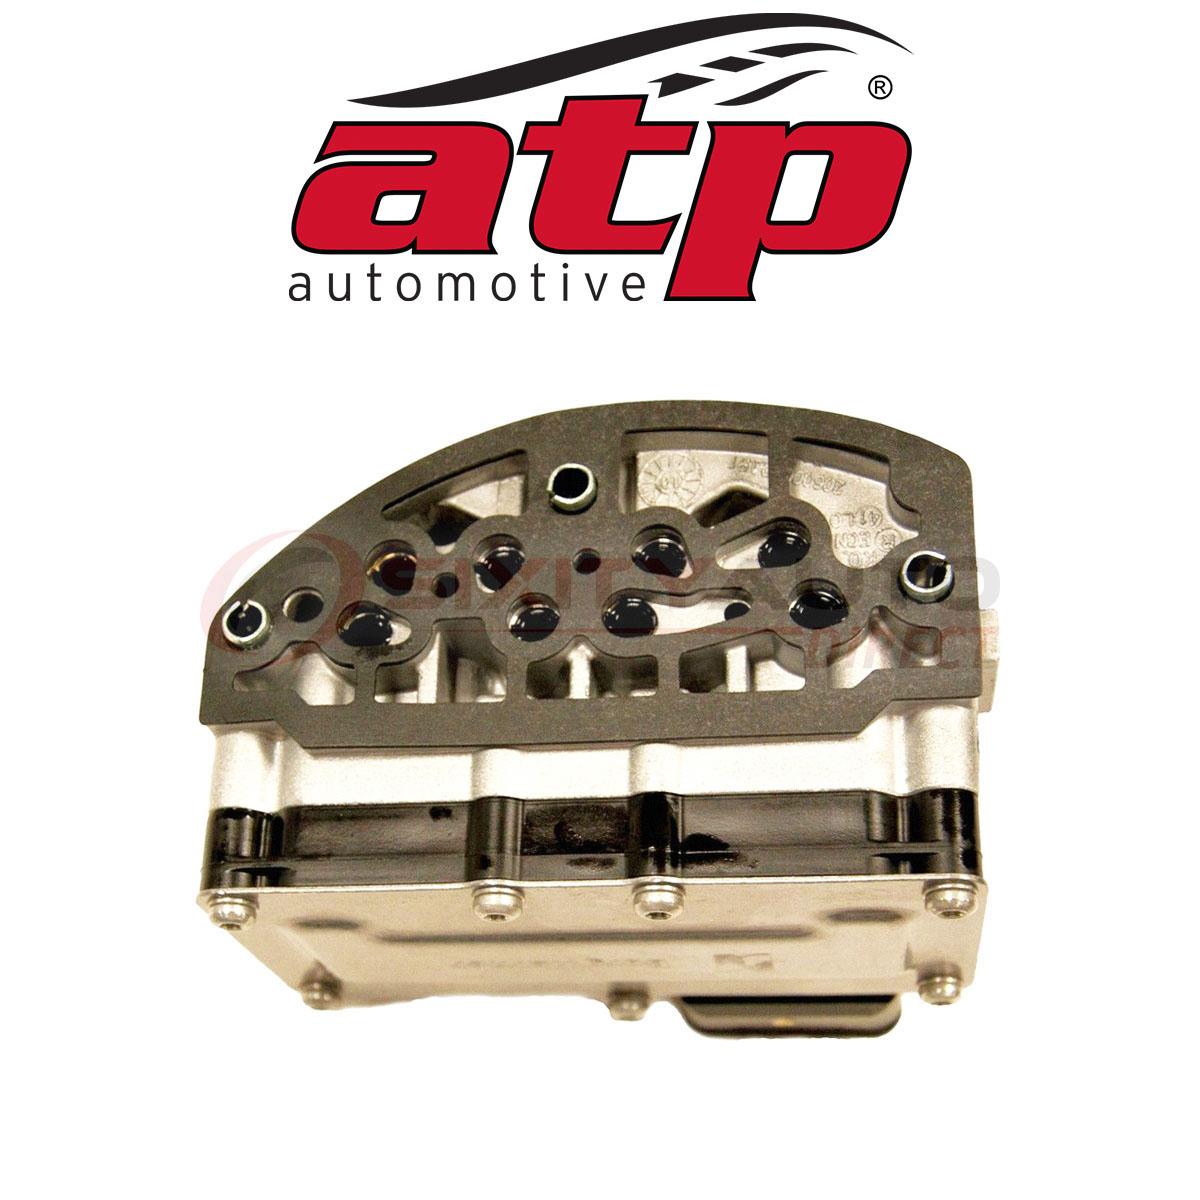 ATP CE-2 Automatic Transmission Control Solenoid